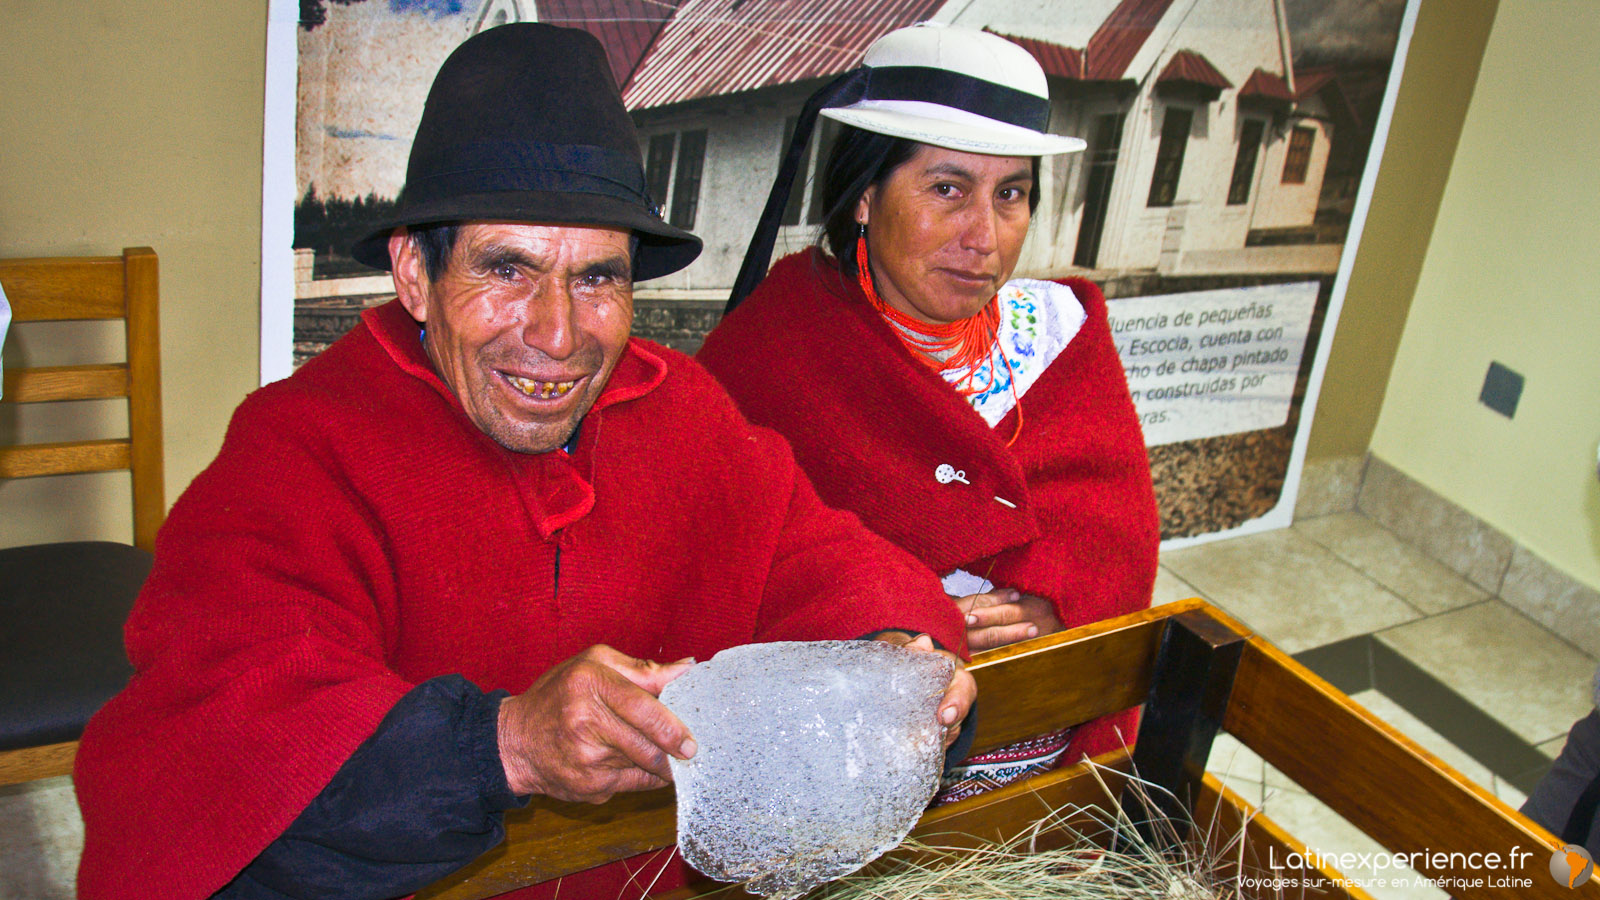 Equateur - Voyage en train -Balthazar Uscha - Latinexperience voyages